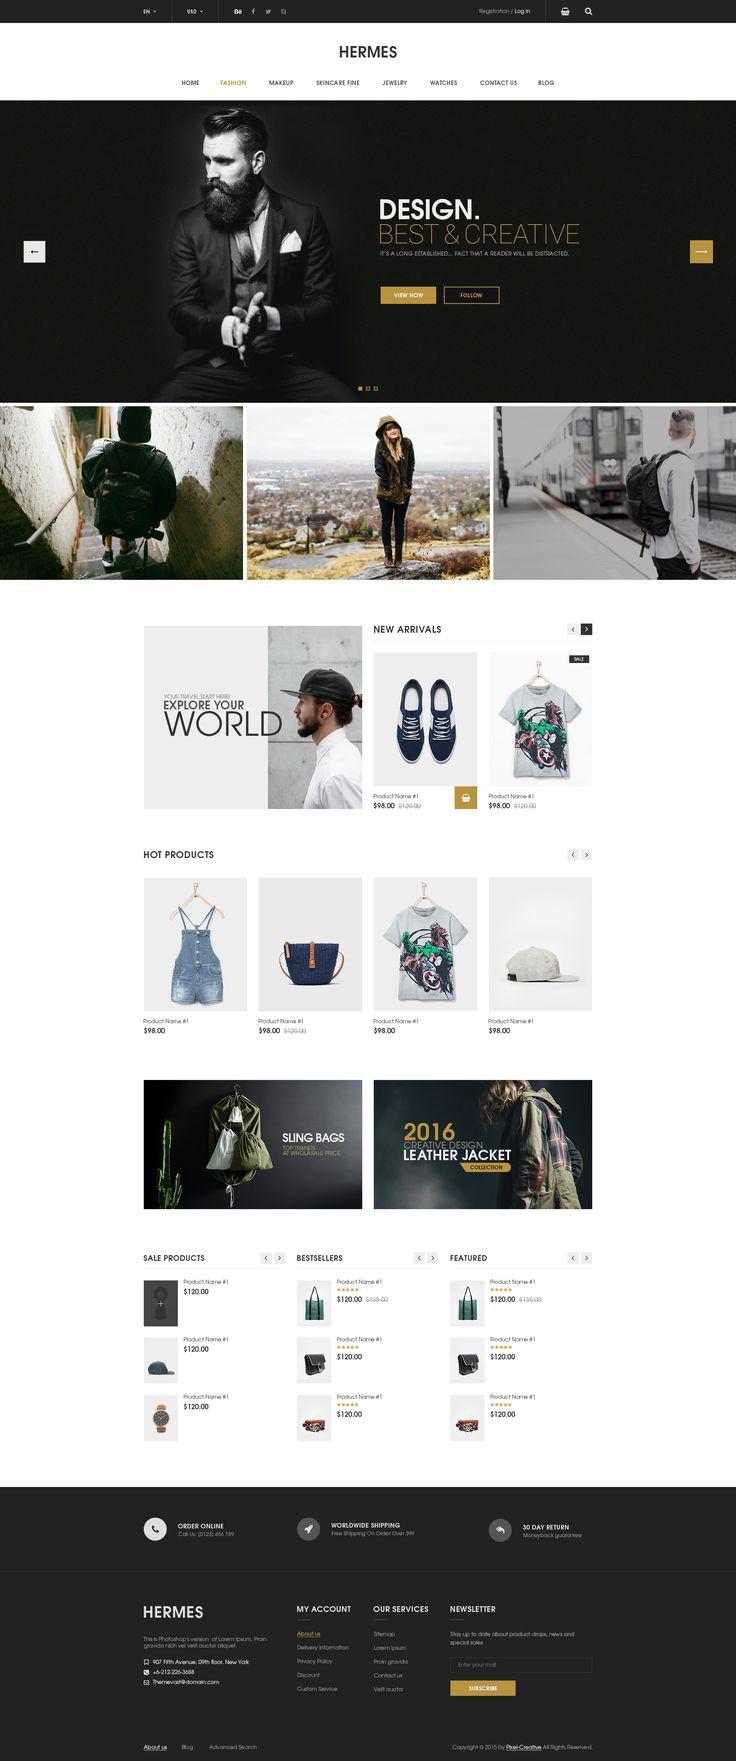 Hermes - eCommerce PSD Template - PSD Templates | ThemeForest